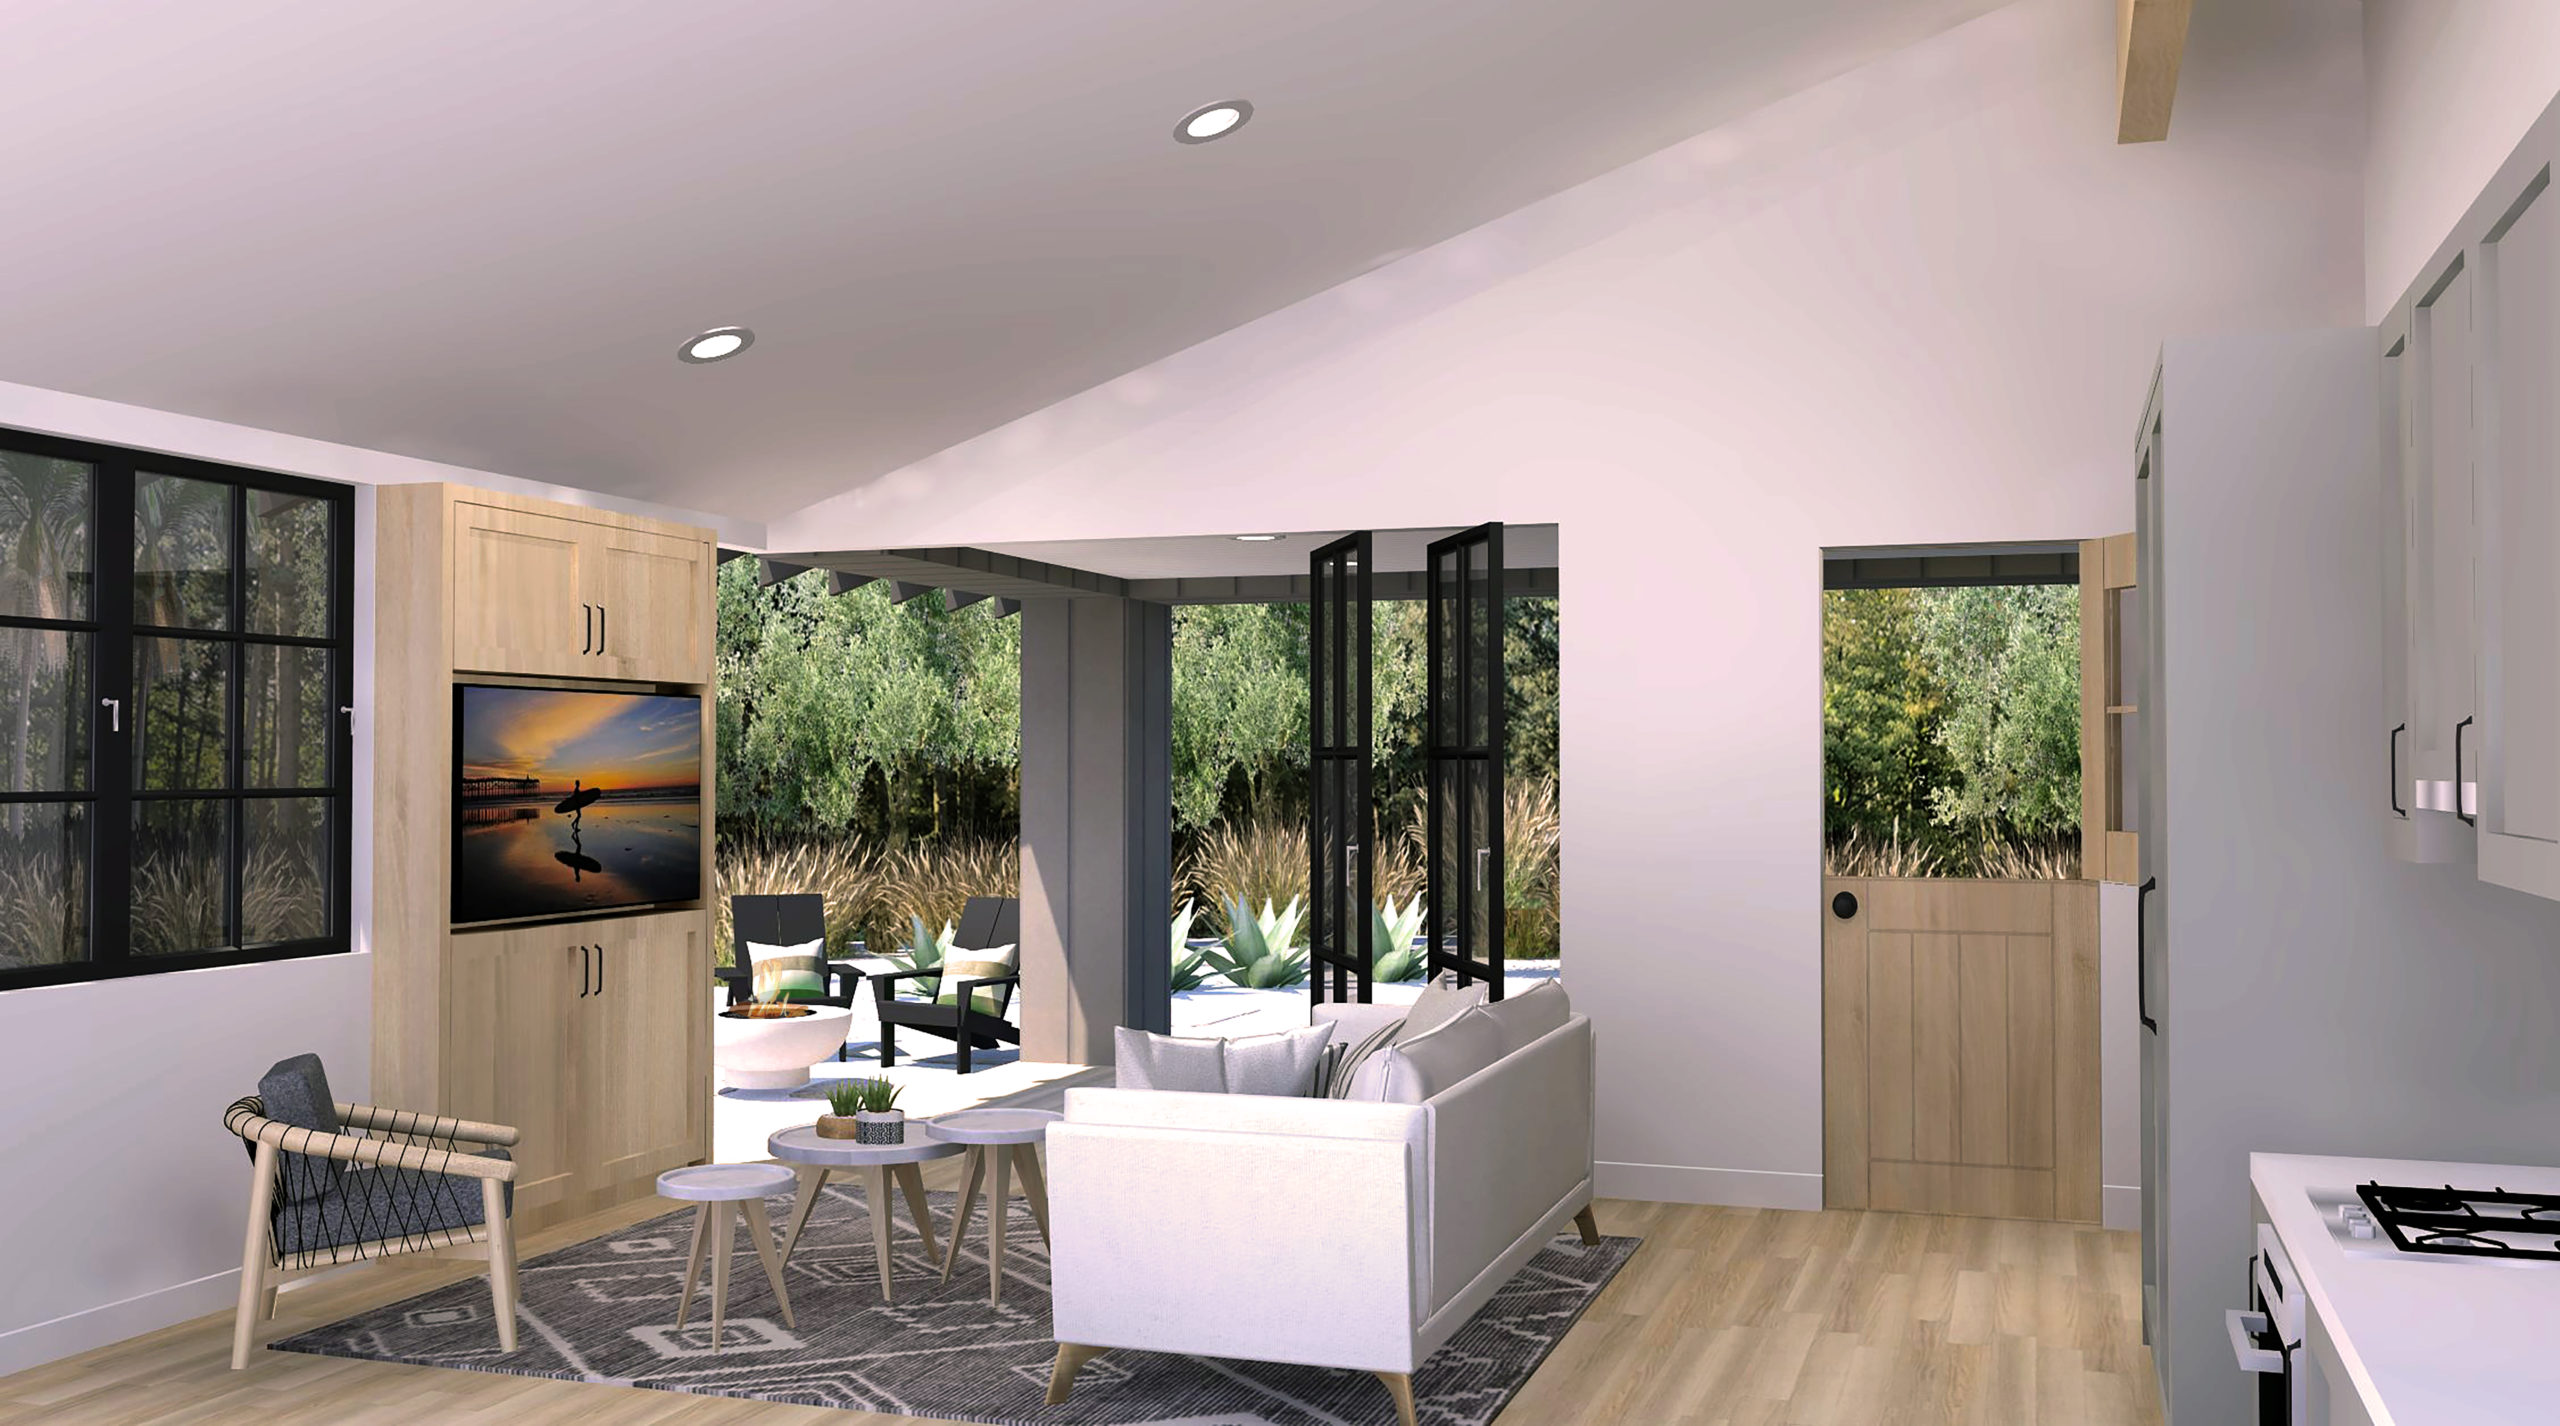 Cross Ready-to-Build_2bd-1ba_749 SF ADU great room rendering